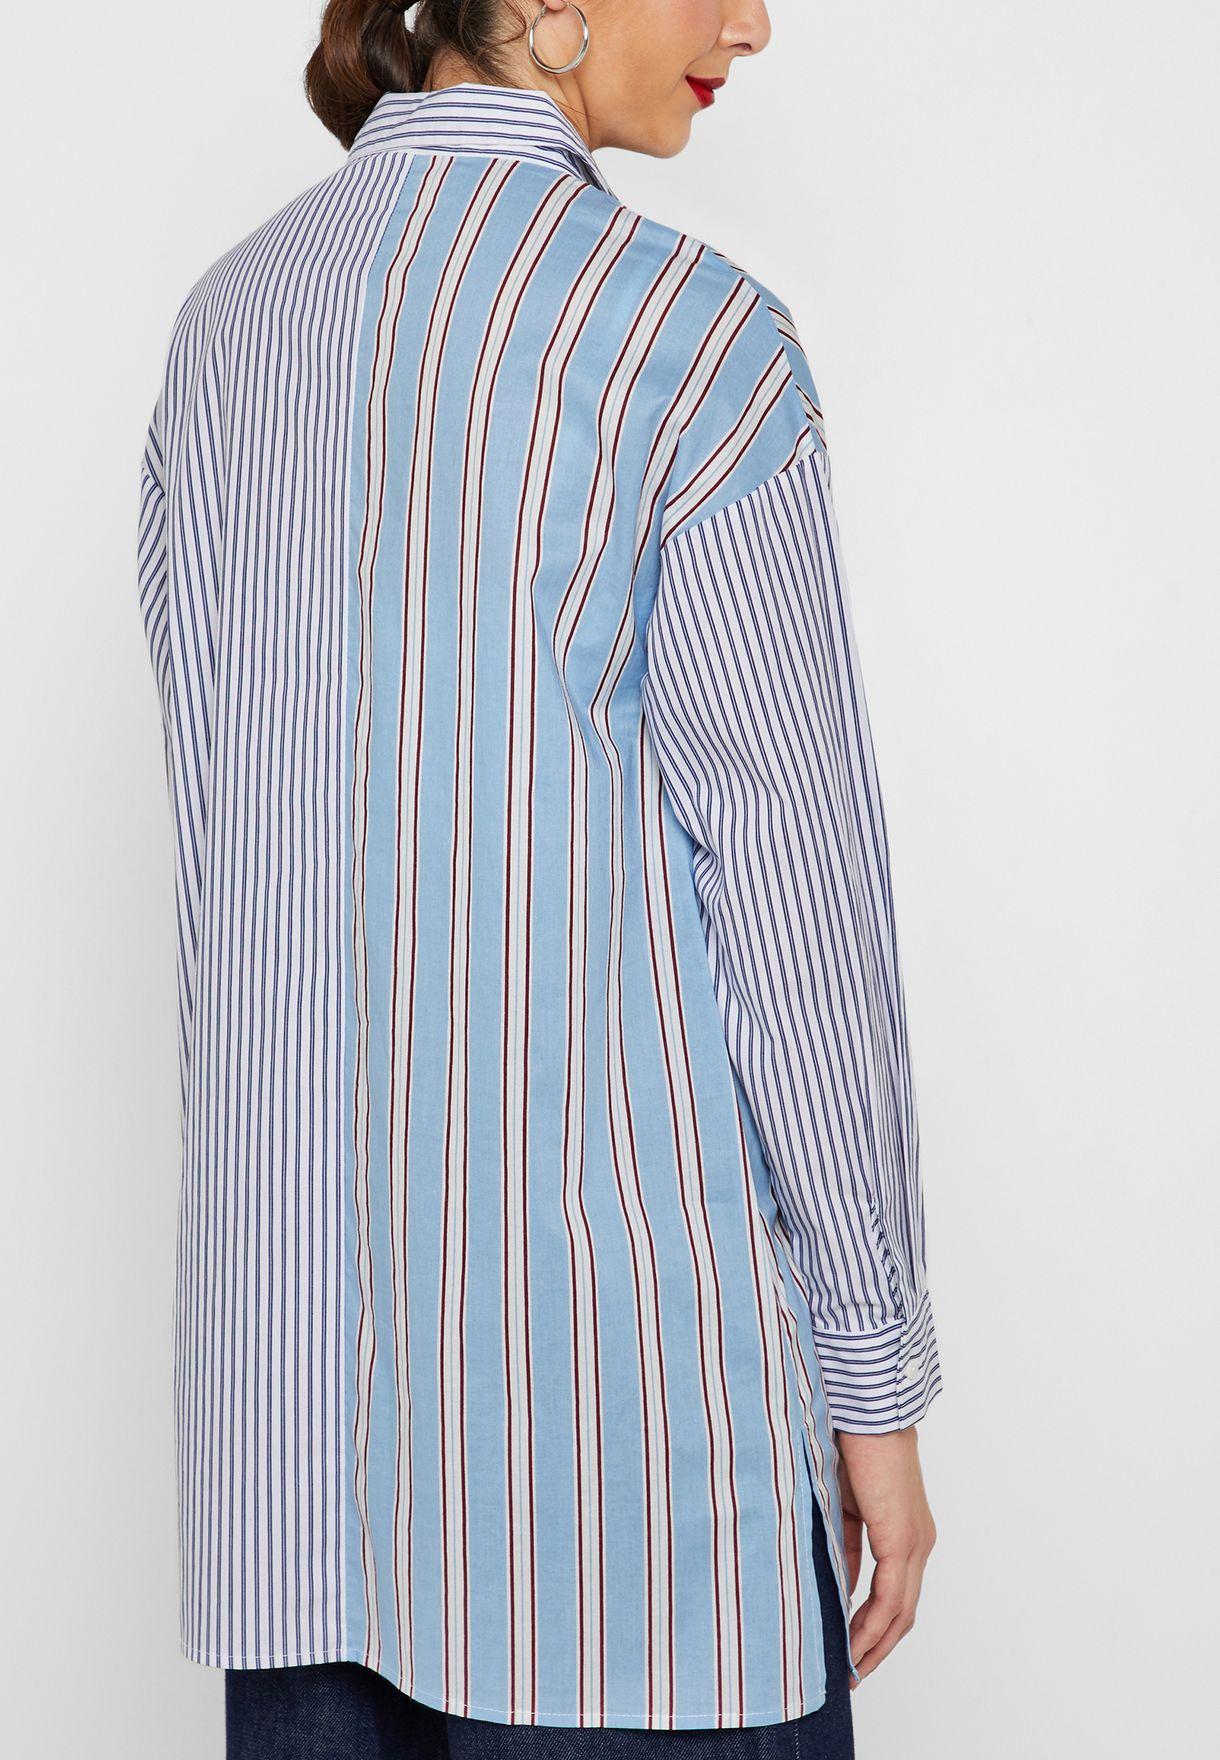 قميص طويل بخطوط